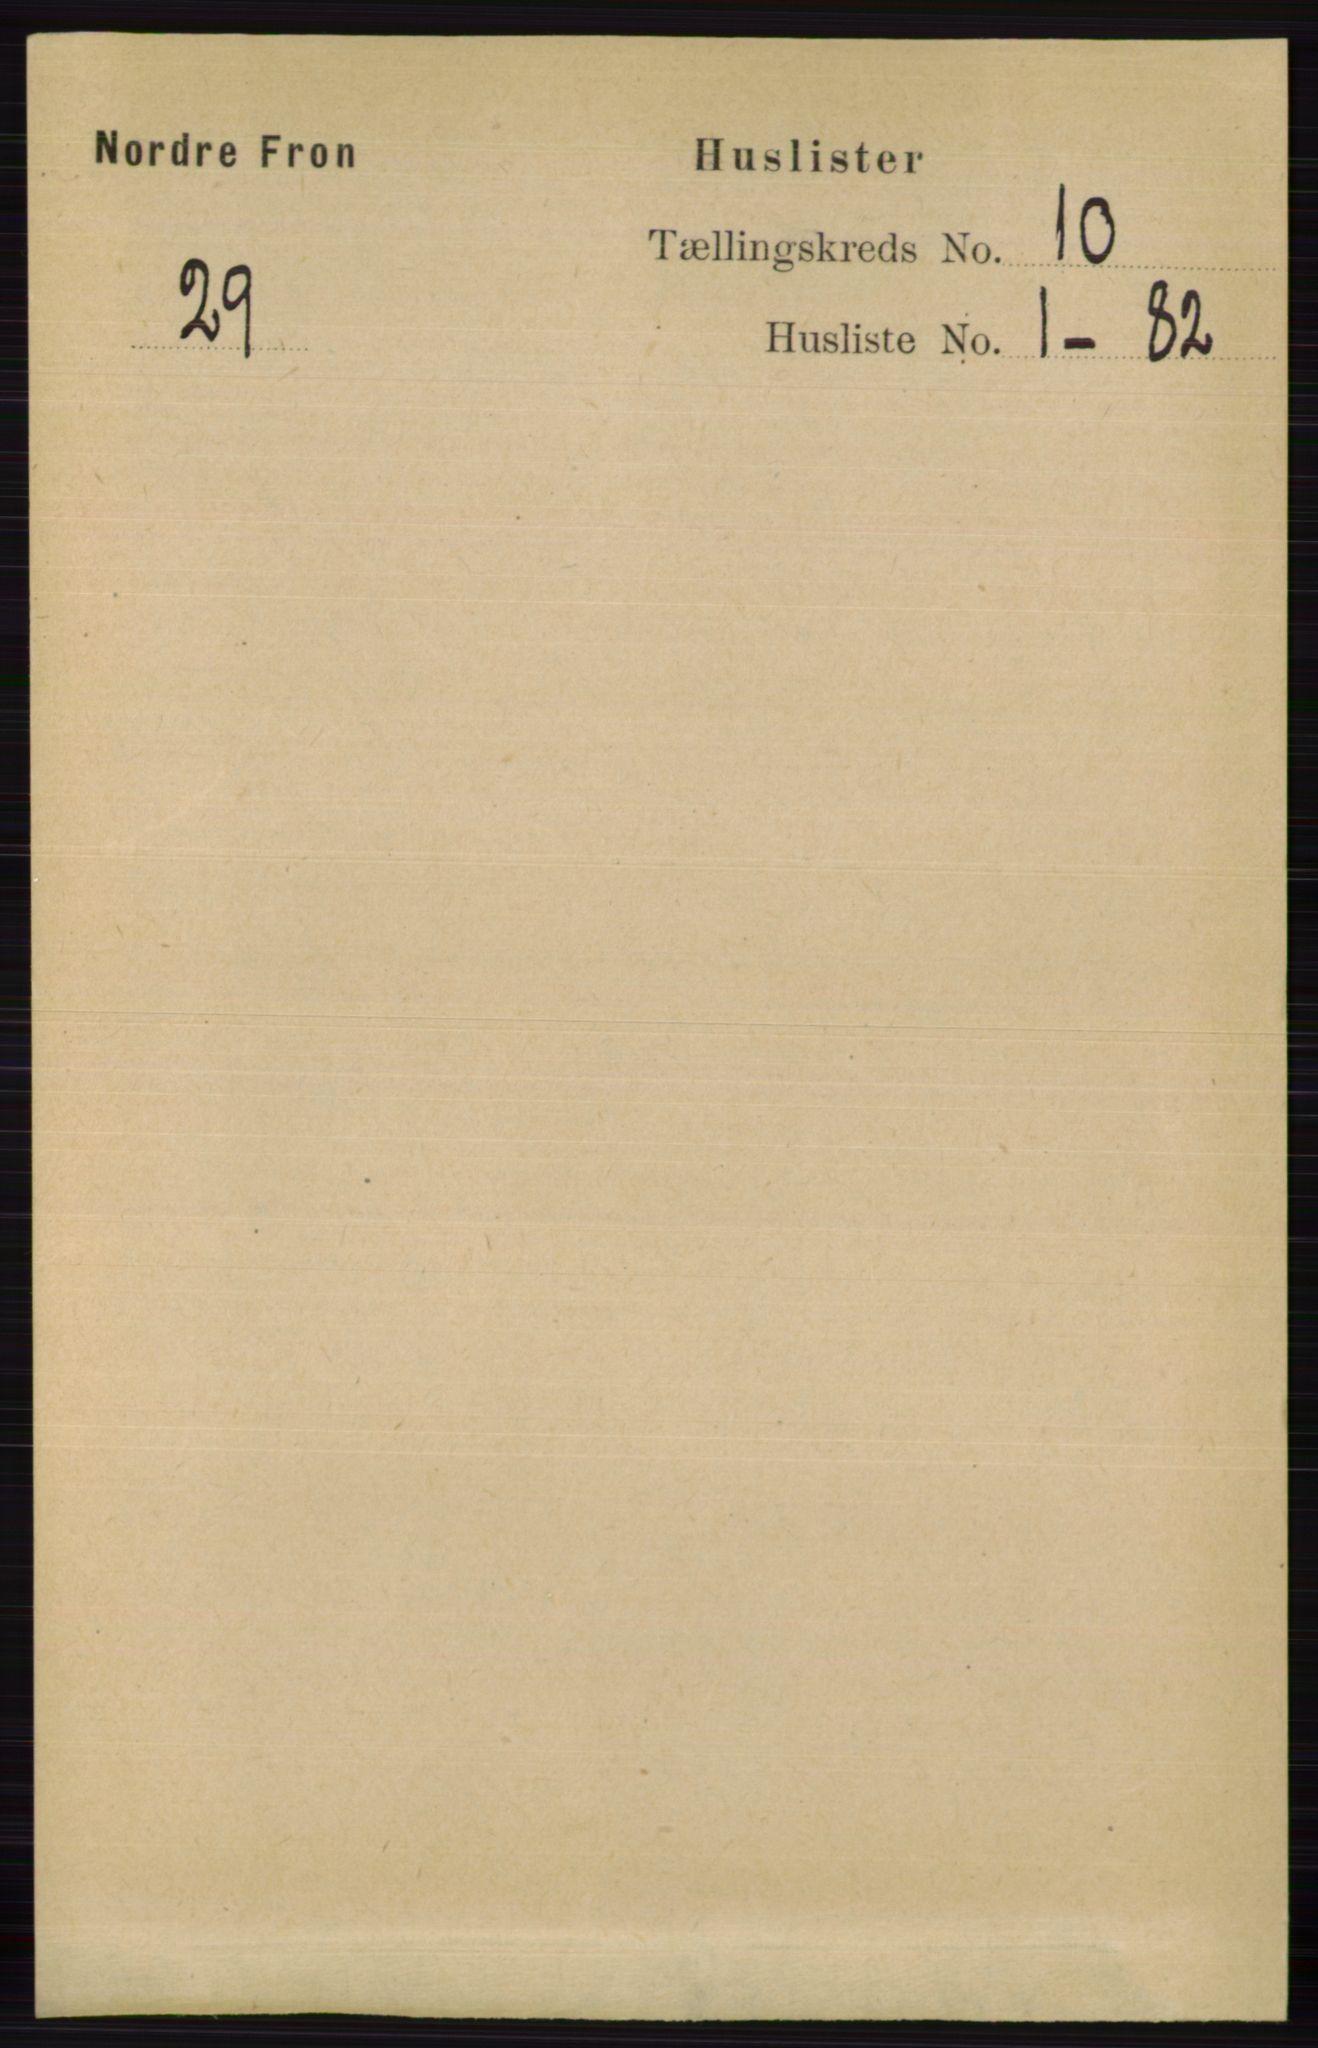 RA, Folketelling 1891 for 0518 Nord-Fron herred, 1891, s. 4300